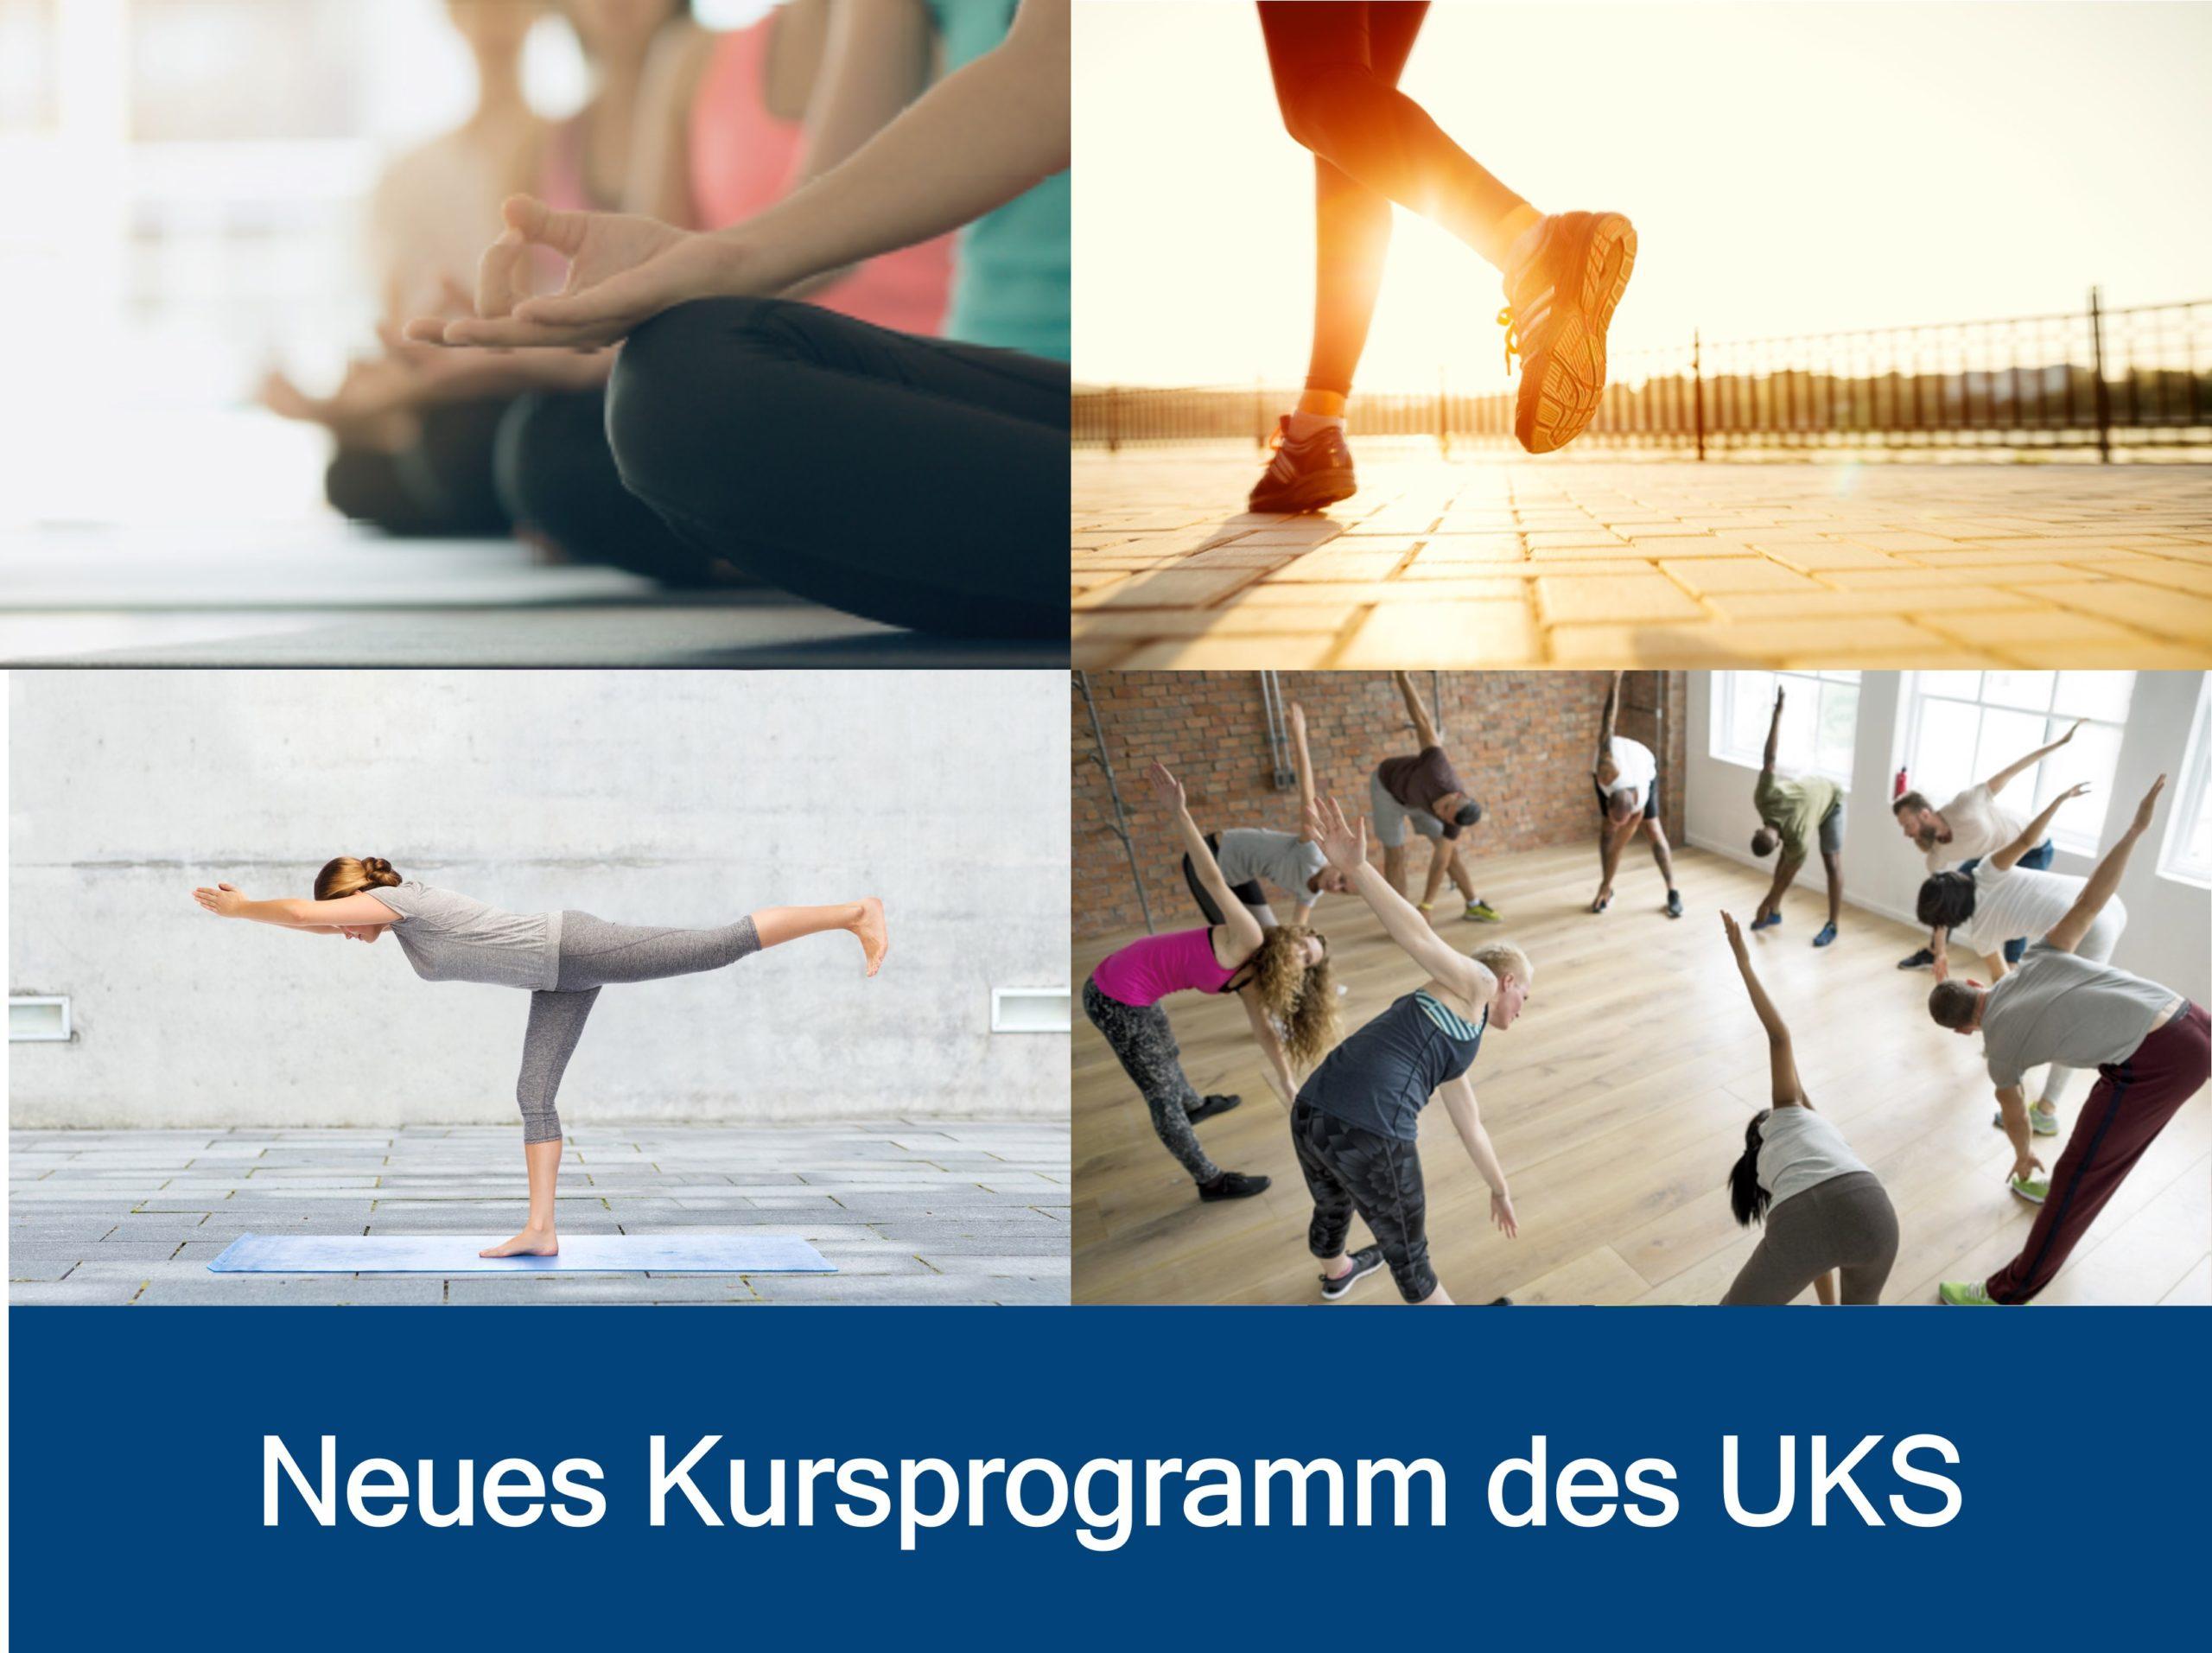 UKS Kursprogramm Start 202108 1 scaled